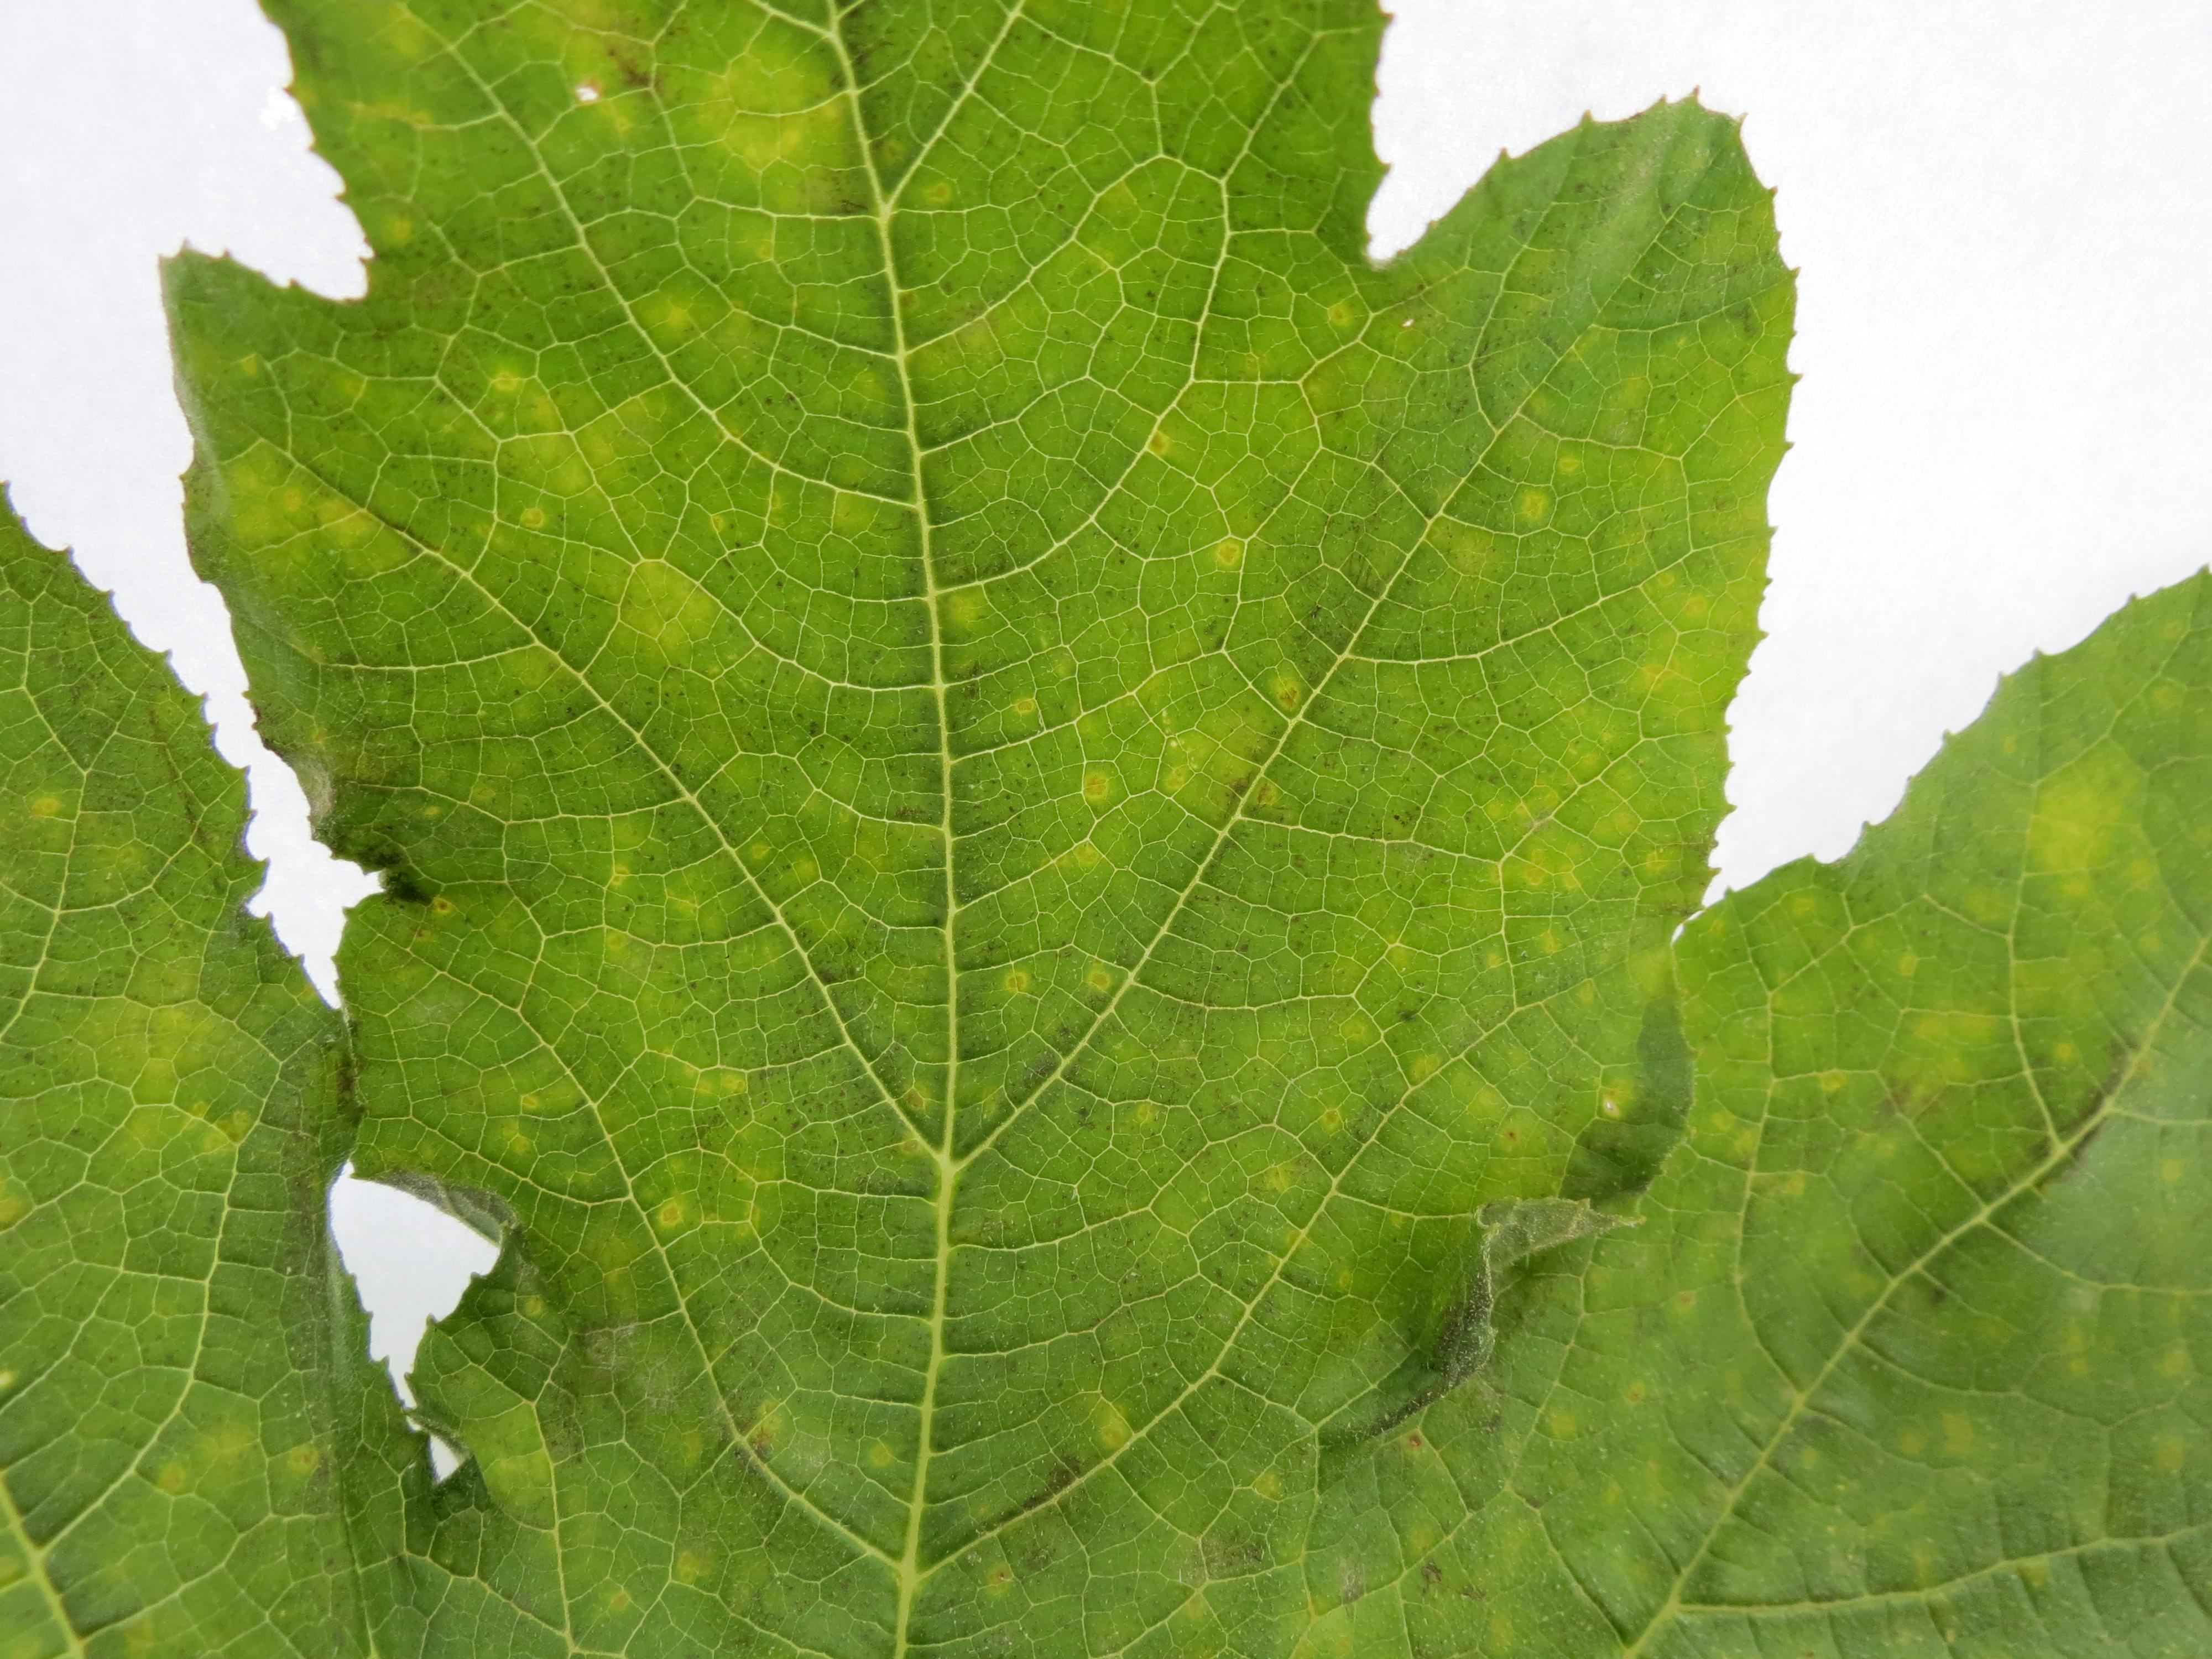 Close-up of cucurbit downy mildew symptoms on squash leaf (Photo Dr. Lina Quesada, NCSU Vegetable Pathology Lab)